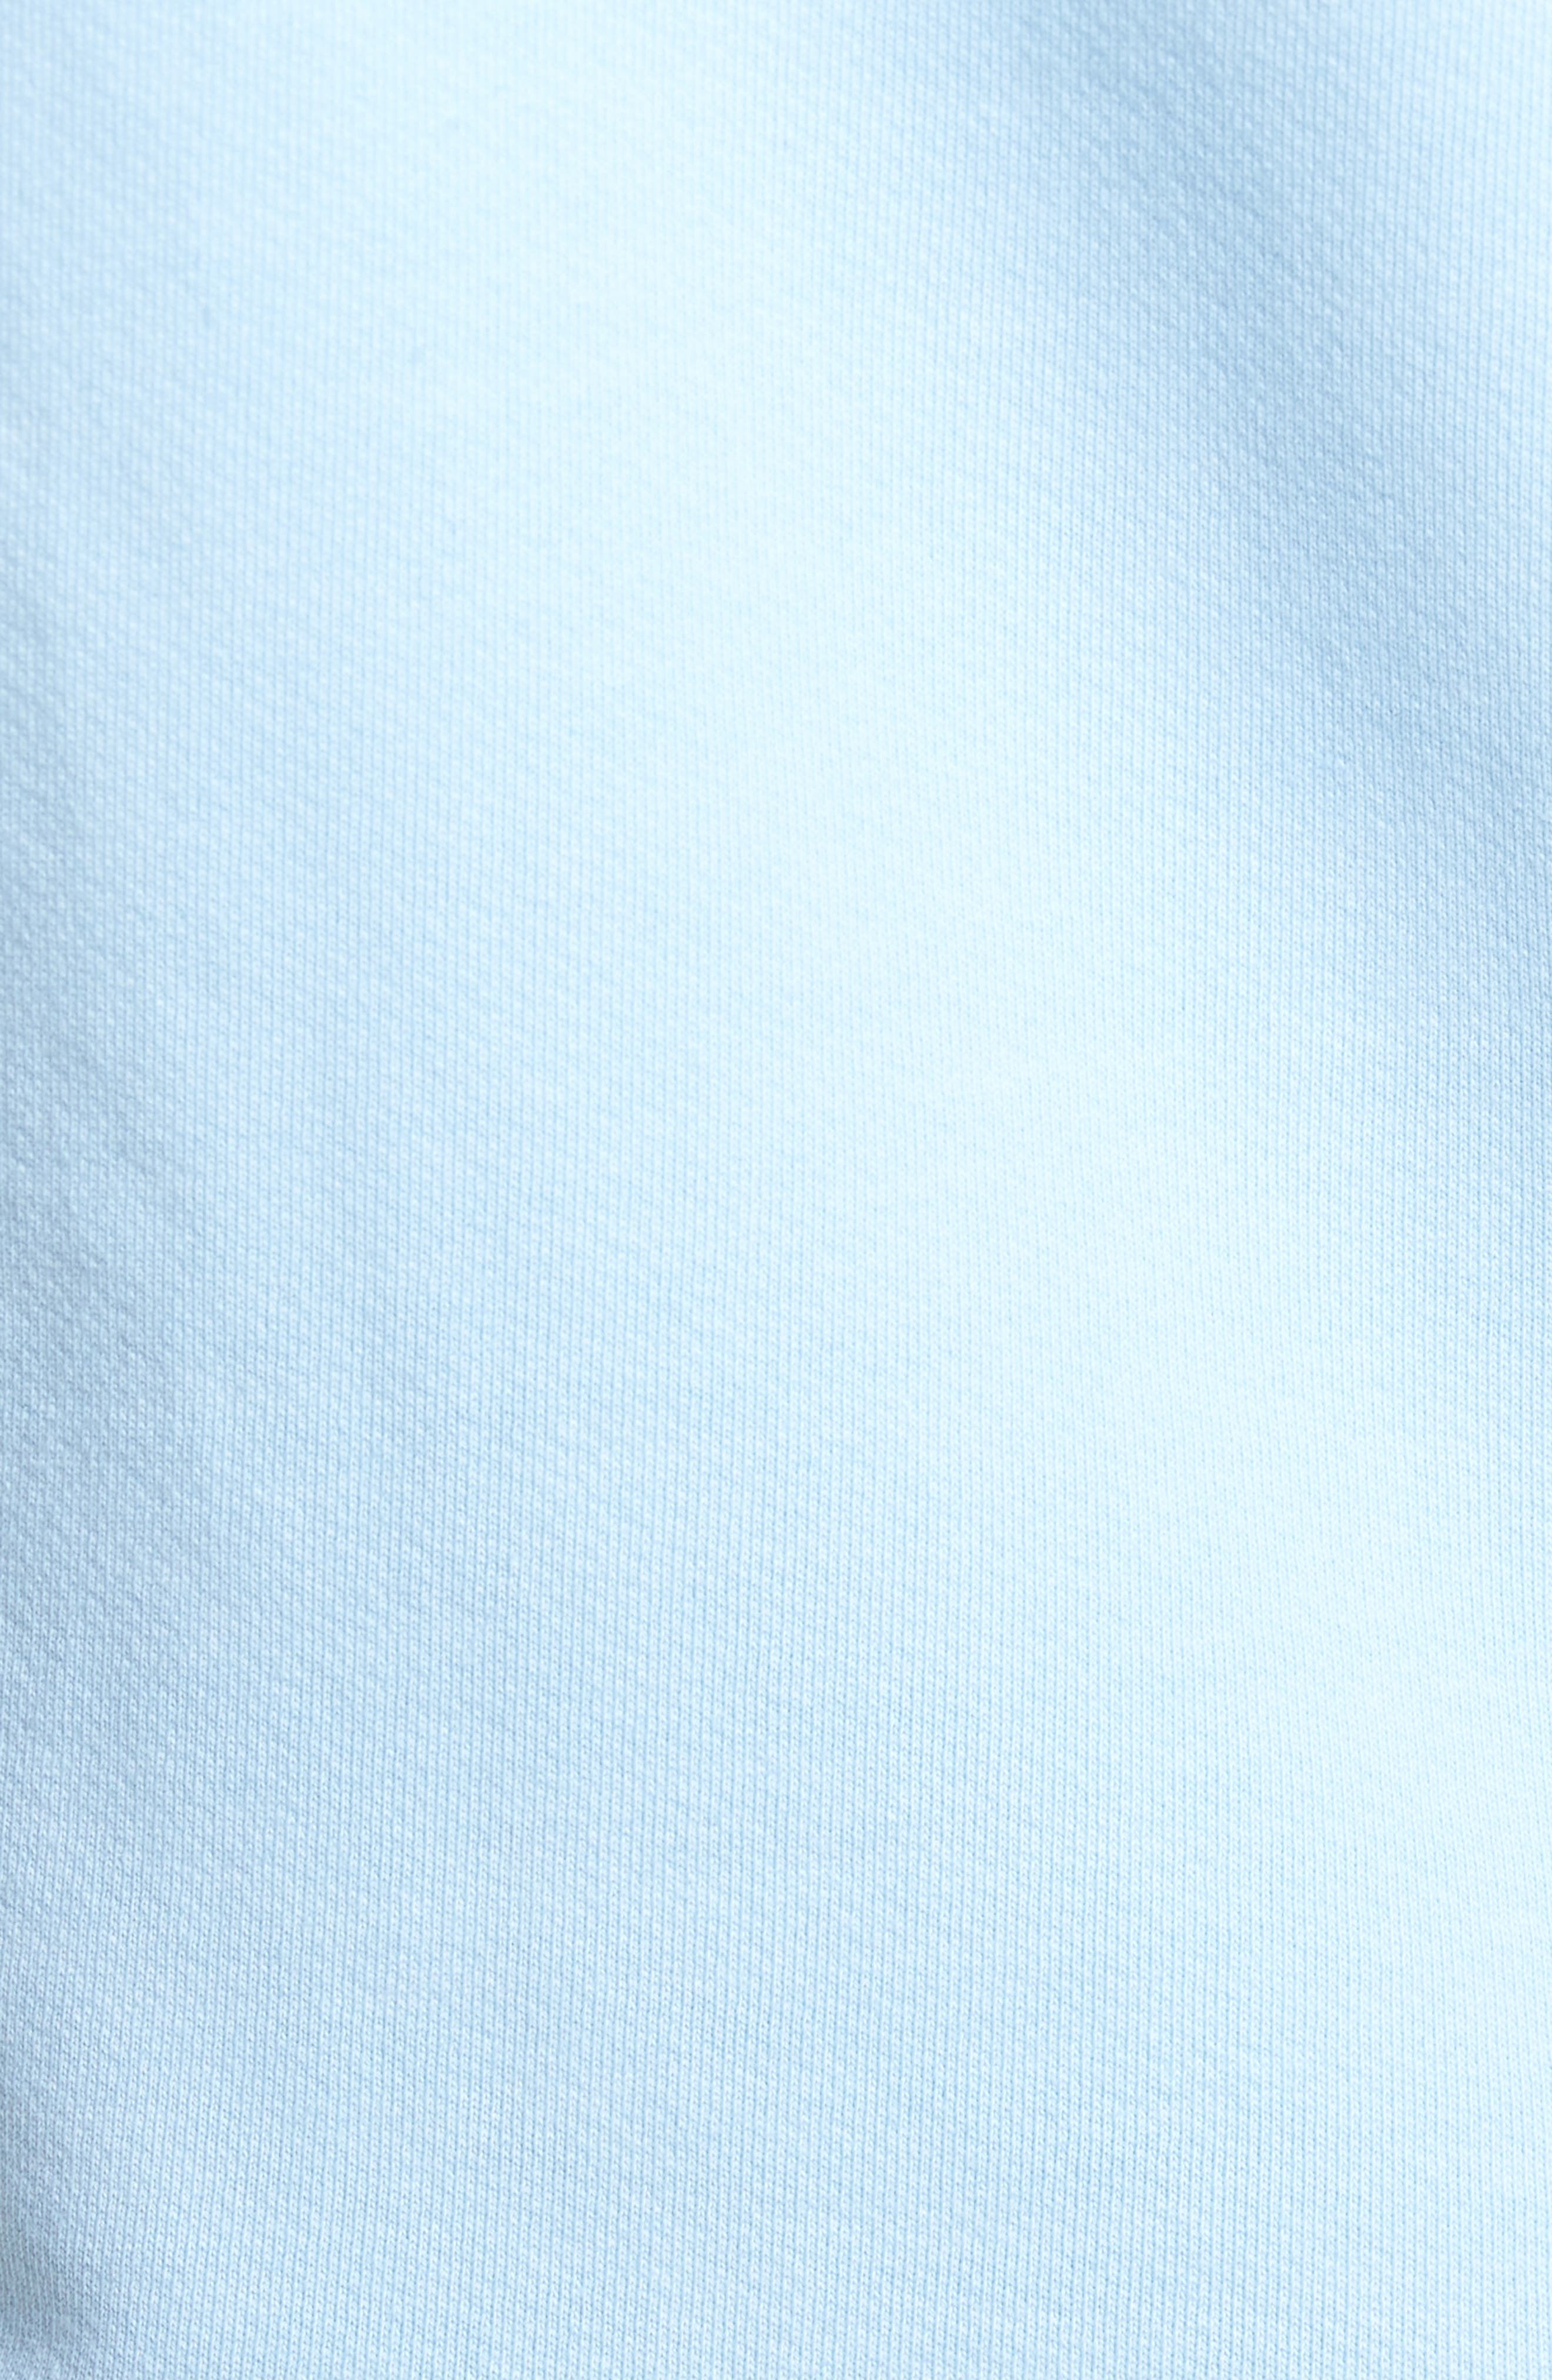 Vintage Crewneck Sweatshirt,                             Alternate thumbnail 5, color,                             400